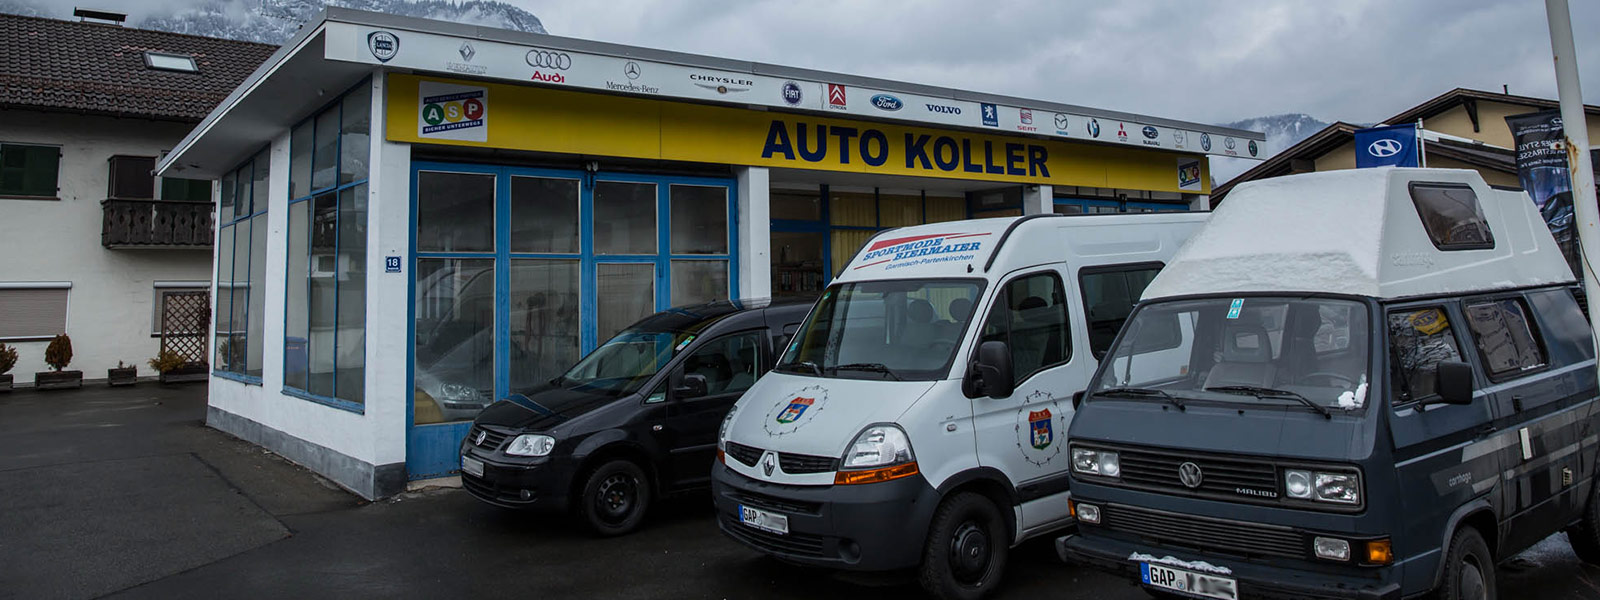 Auto-Koller-Garmisch-Partenkirchen_slider_02.jpg